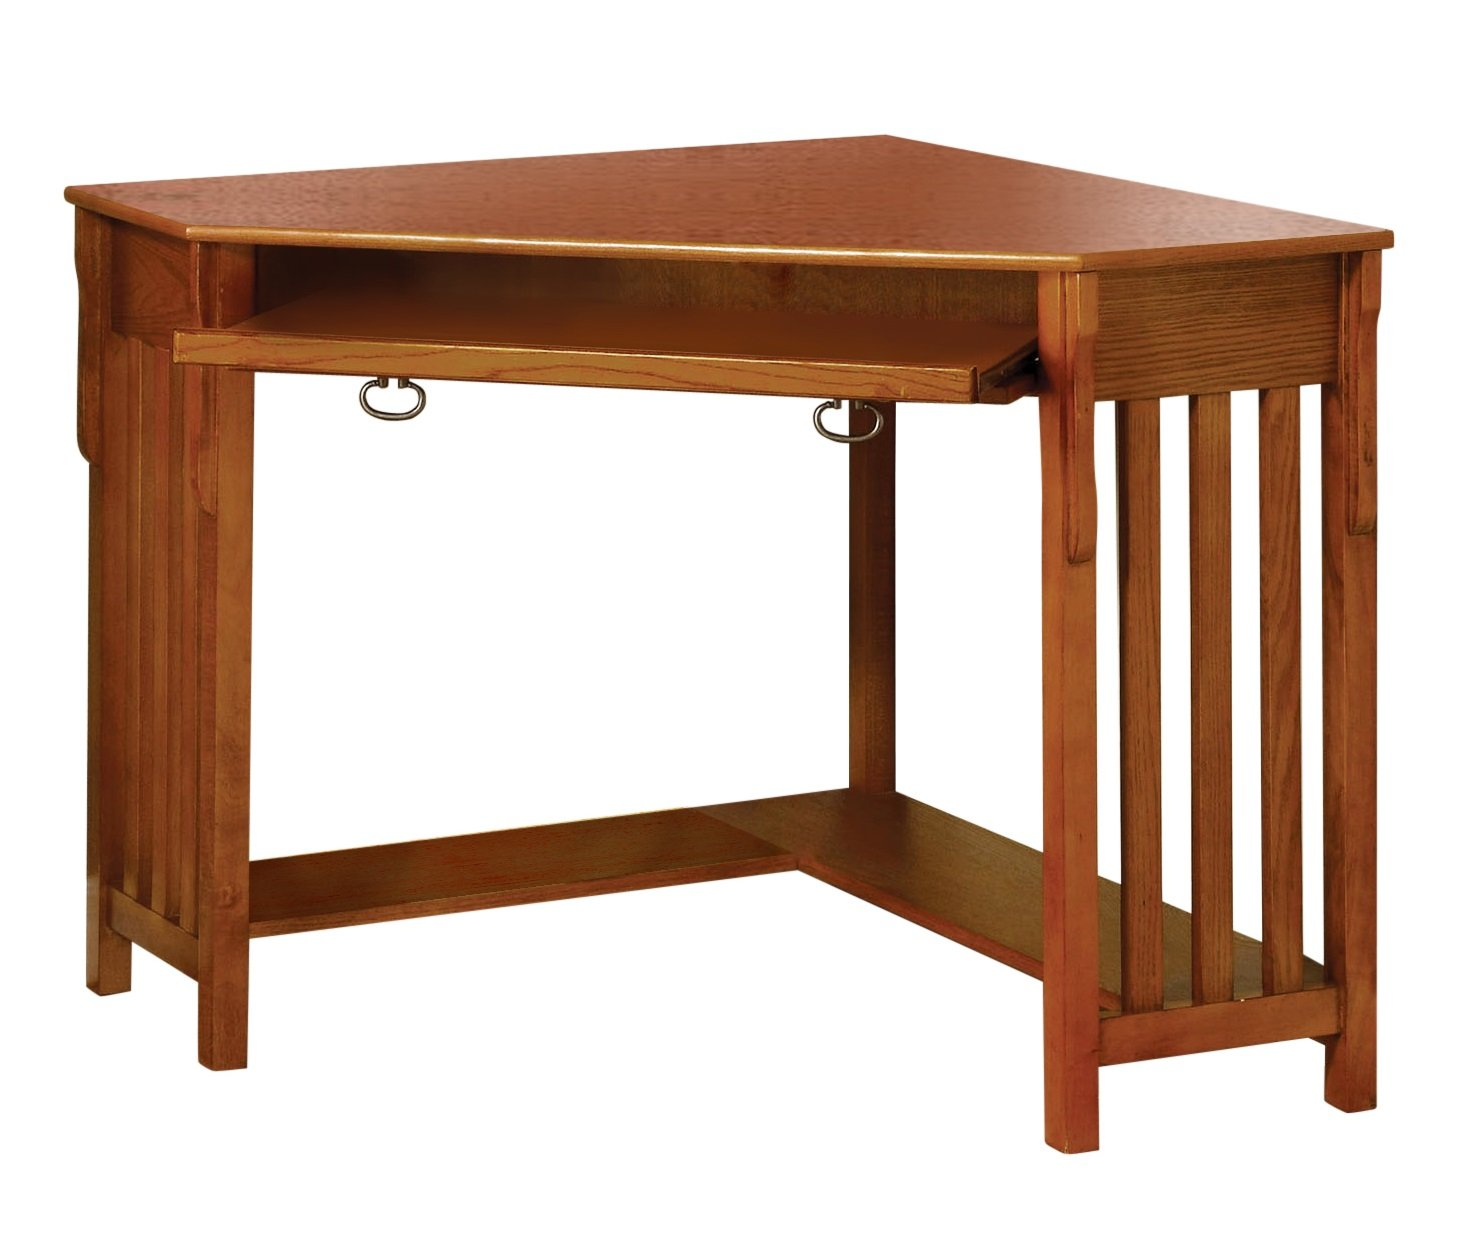 Furniture of America Athosia Mission Style Corner Computer Desk, Medium Oak Finish by Furniture of America